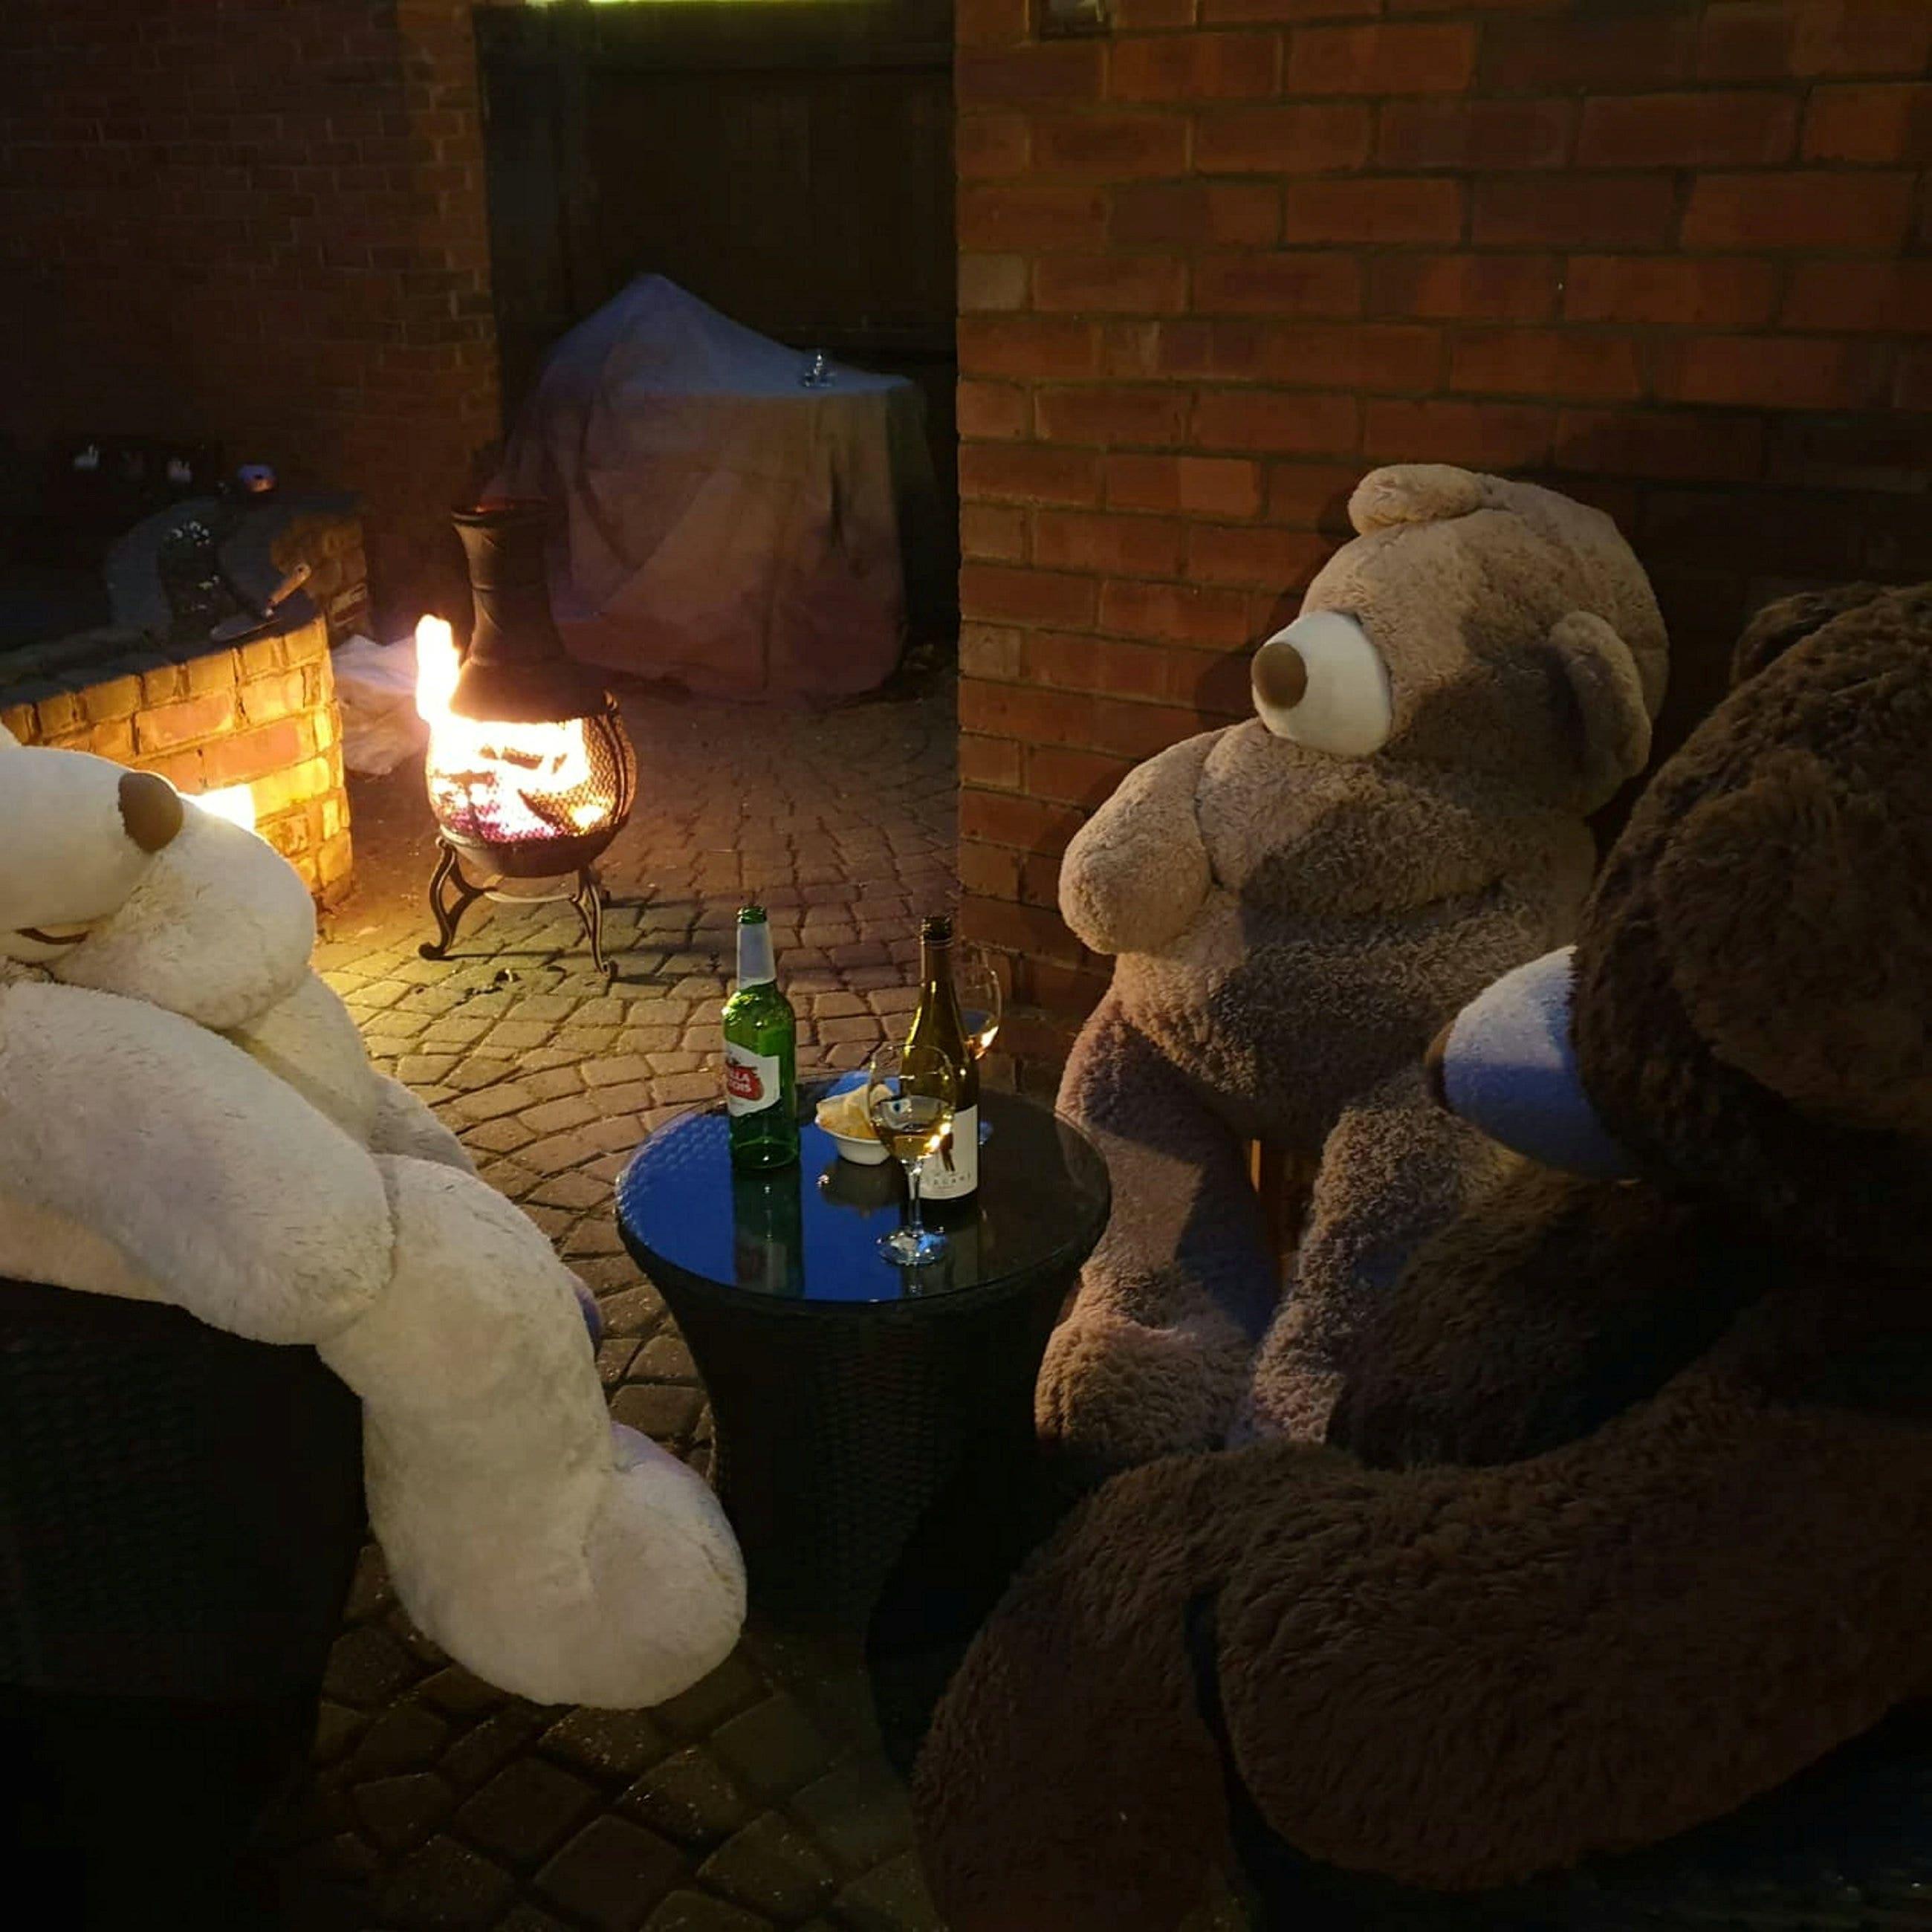 Coronavirus καραντίνα: Μαμά διασκεδάζει οικογένεια θέτοντας αρκουδάκια γύρω από το σπίτι